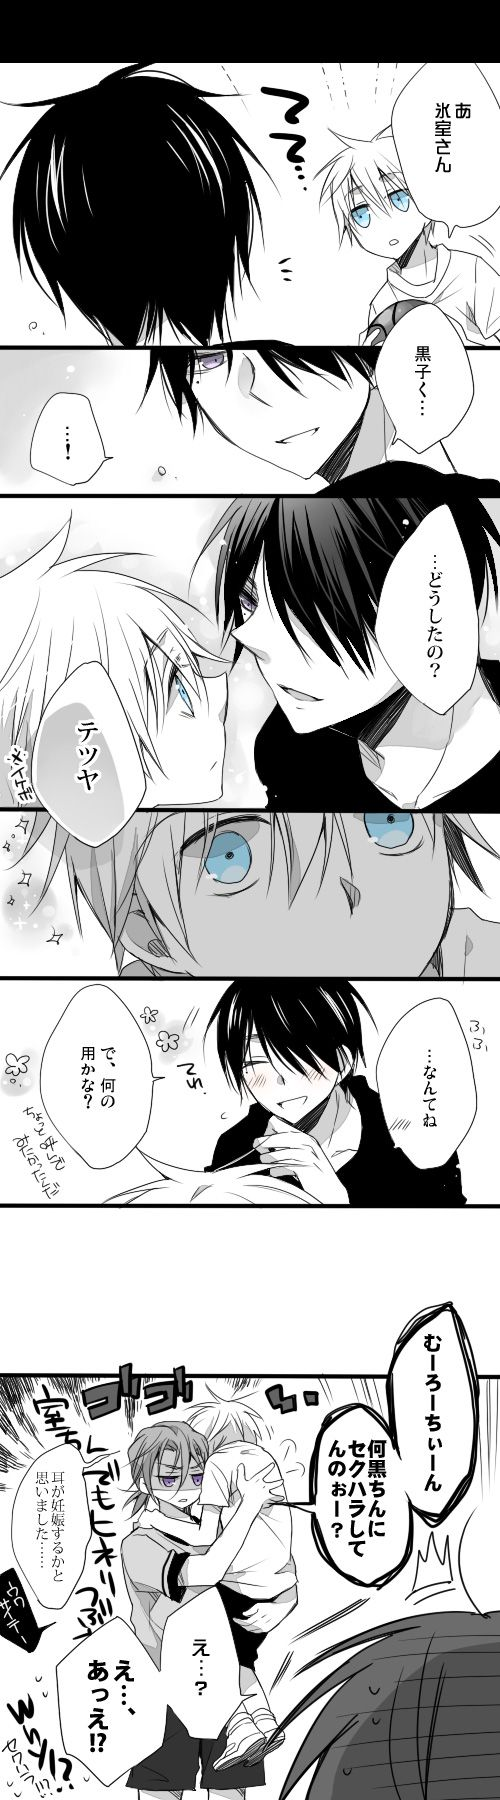 Kuro: Ah, Himuro-san. Himu: Kuroko-ku-…! What's wrong, Tetsuya? Just joking. Did you need something from me?  Murasaki: Muuroochiinn, why did you sexually harass Kurochin? He's telling me in my ears that he thinks he might be pregnant.  Himu: Eh? EHH!?